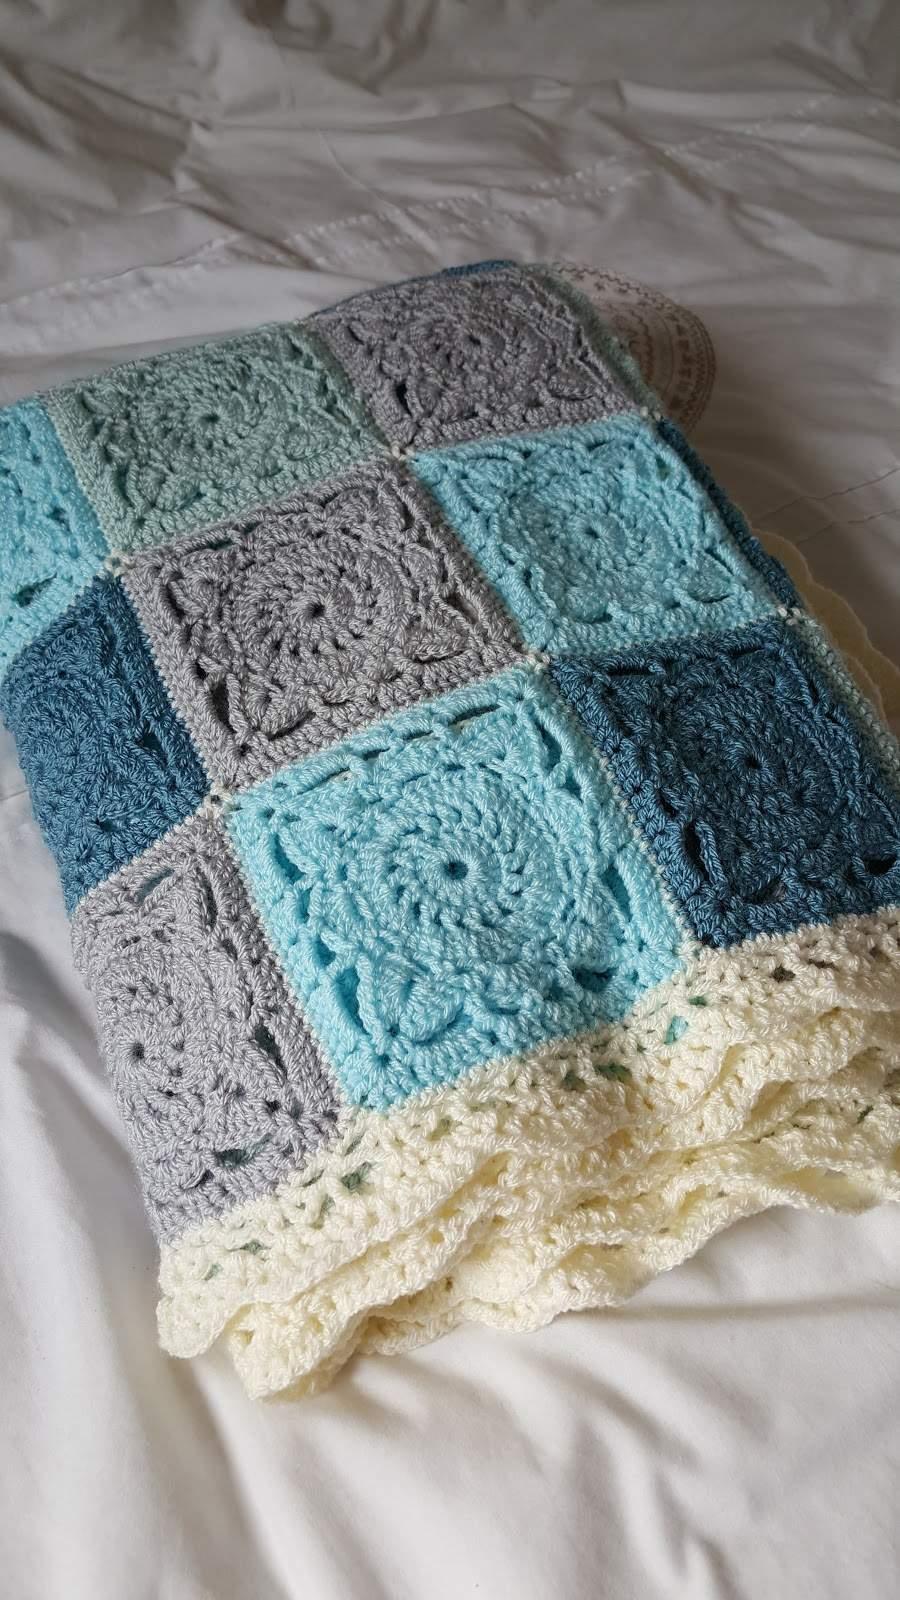 Basic & Standard Patterns for Boy Blanket Crochet Lovely Ba Boy Blanket Crochet Patterns Ba Boy Crochet Blanket